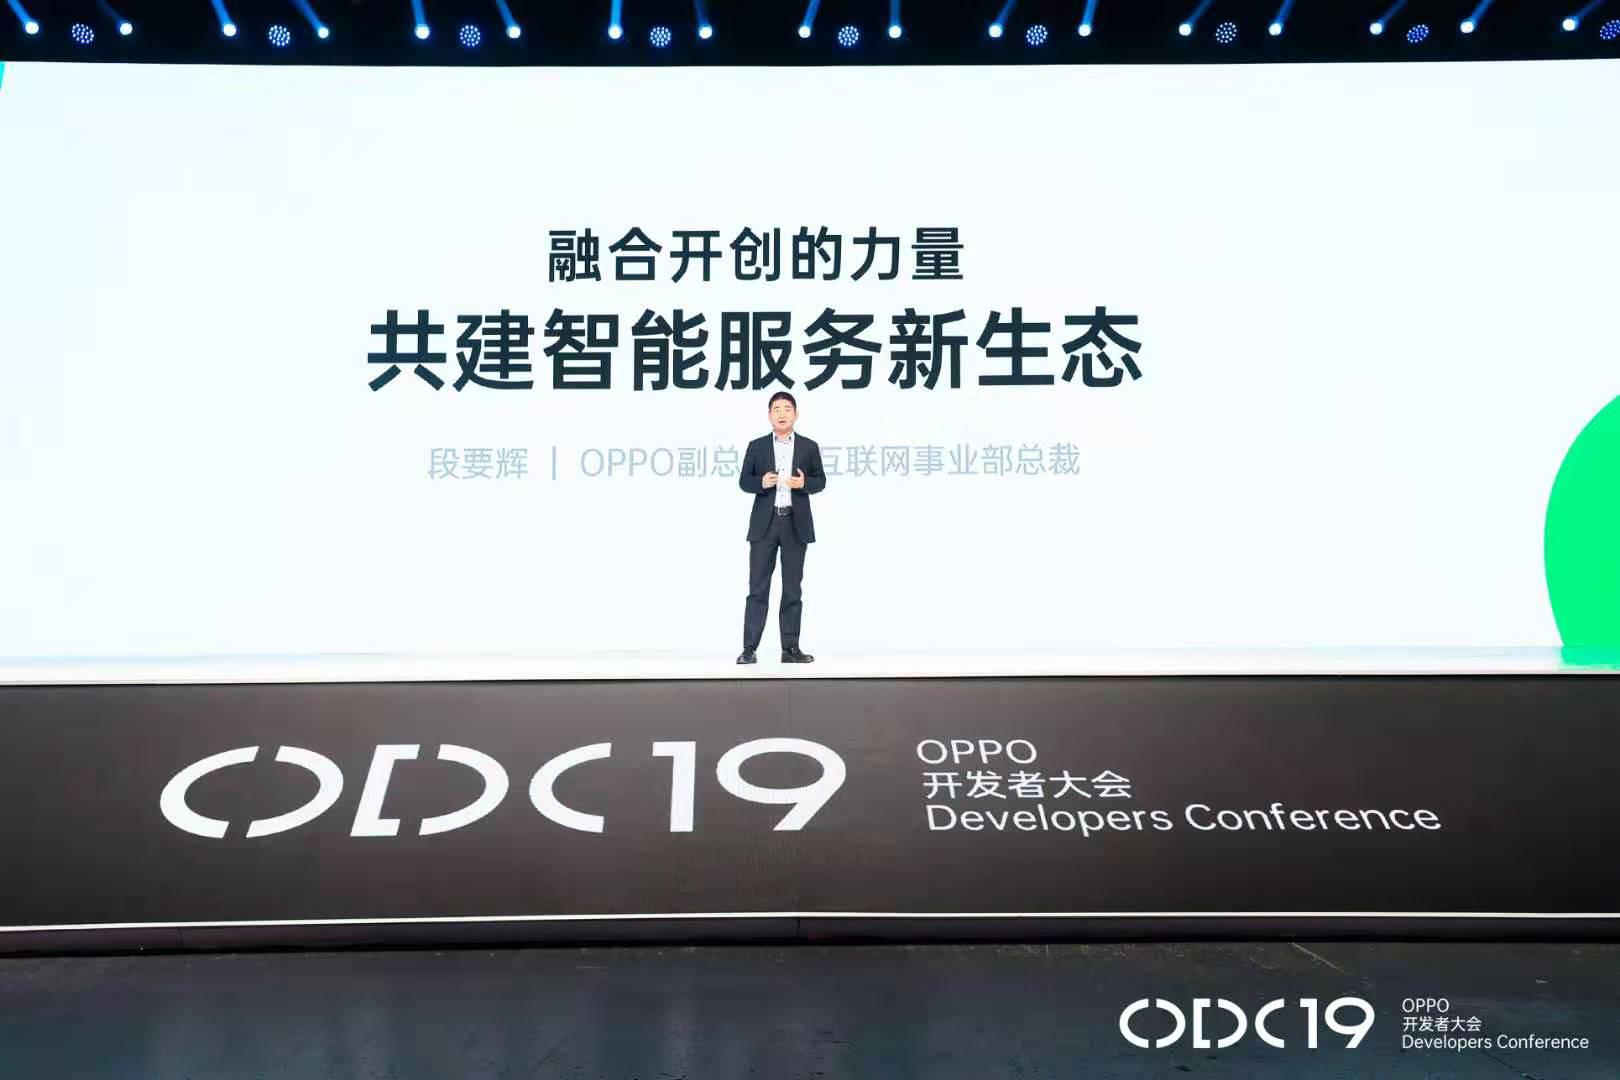 OPPO副总裁段要辉: 全球月活用户数超3.2亿,继续拿出10亿资源扶持开发者